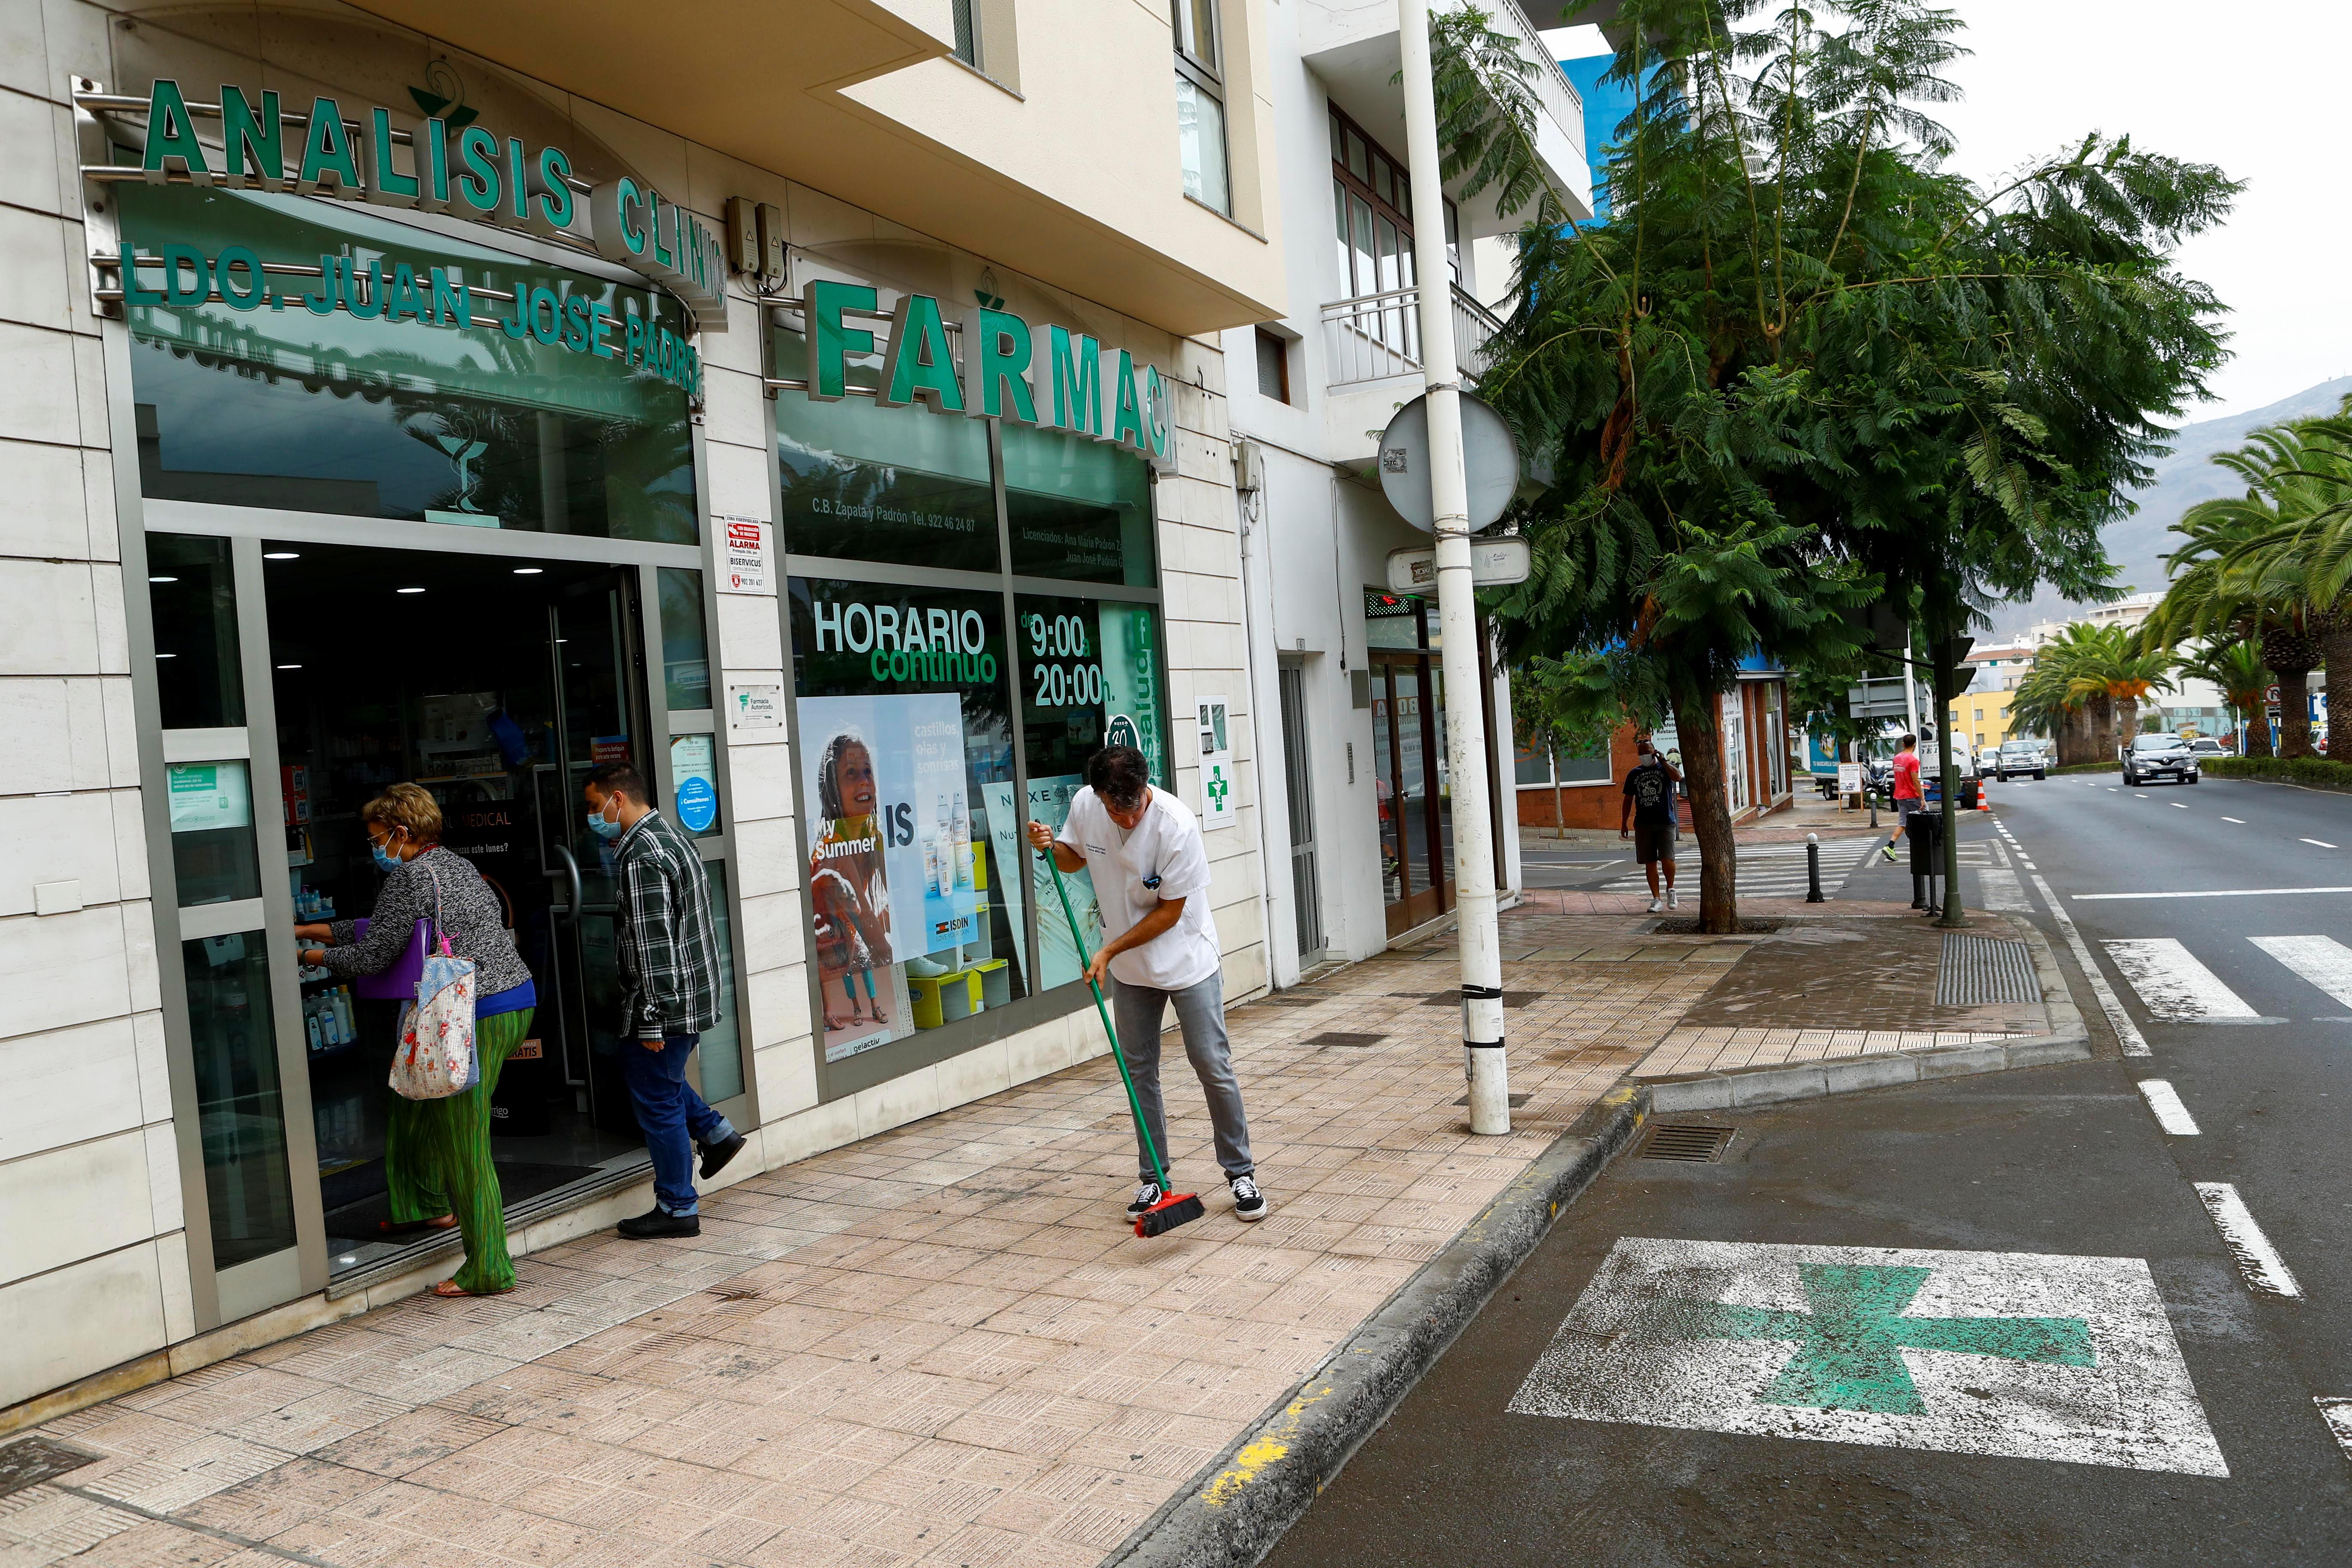 Victor Brito, a pharmacist, sweeps the sidewalk following the eruption of a volcano on the Island of La Palma, in Los Llanos de Aridane, Spain September 22, 2021. REUTERS/Borja Suarez